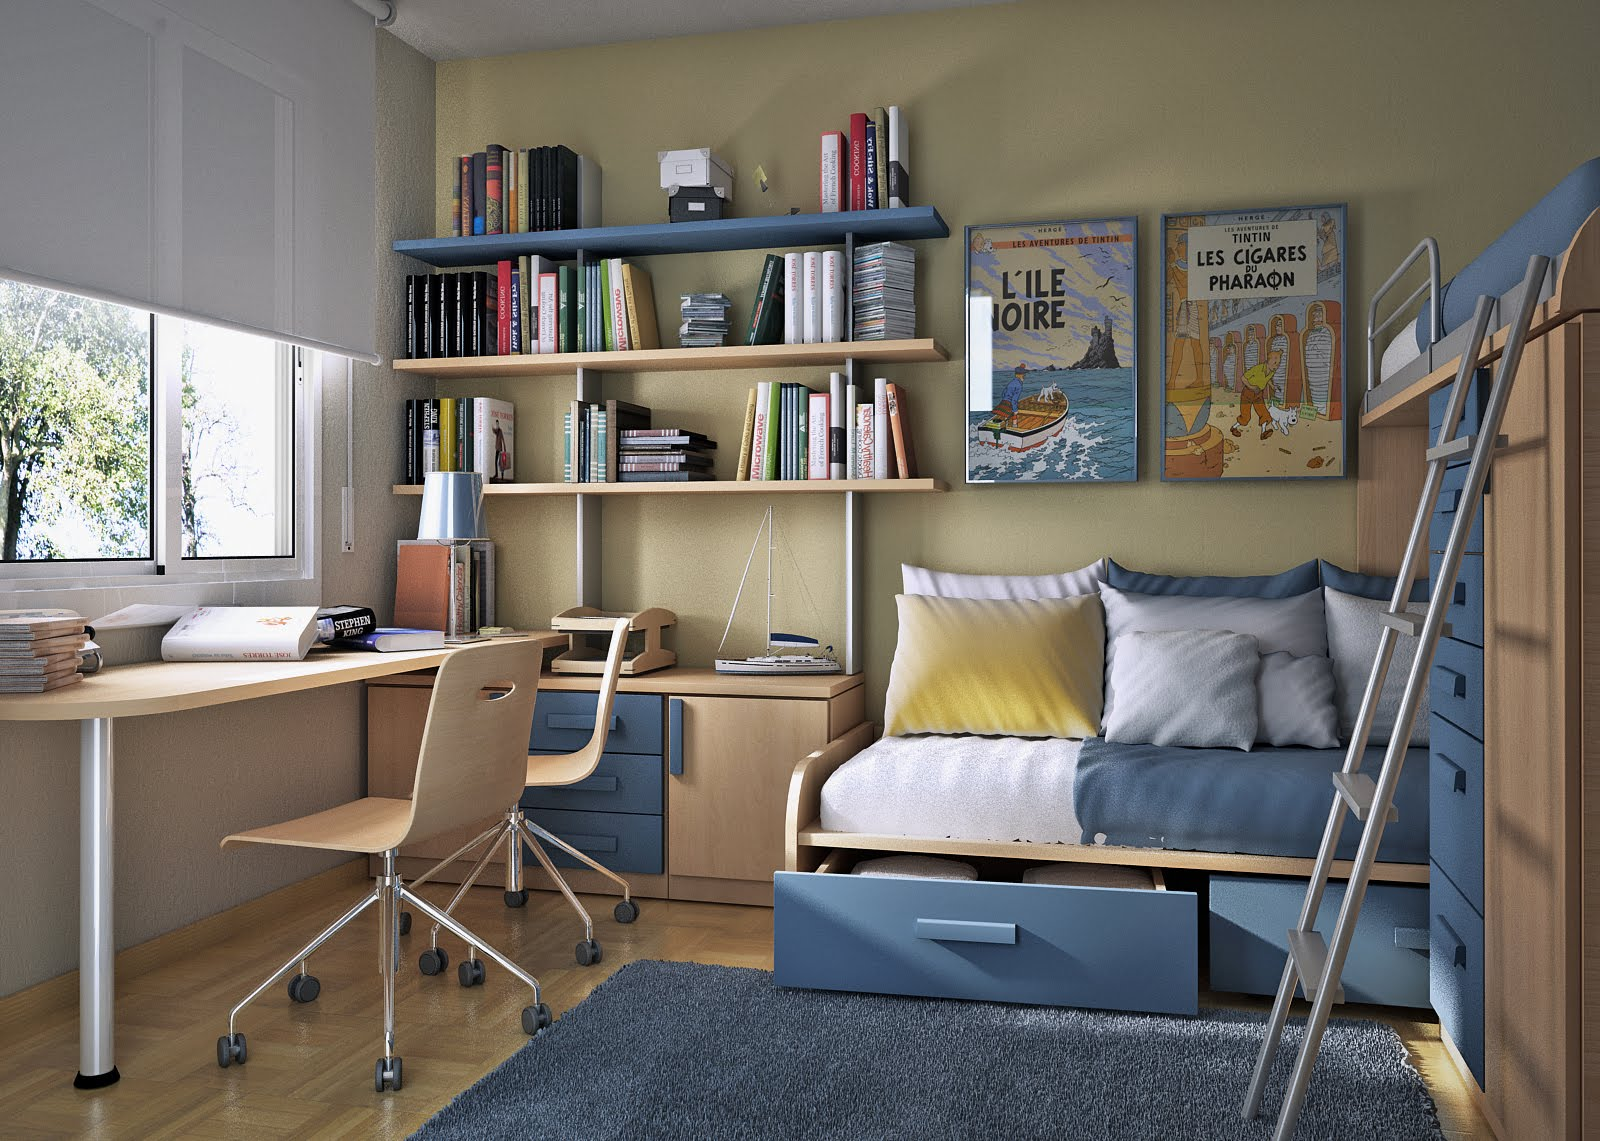 Design ideas small floorspace kids rooms bunk bed blue - Bunk bed designs for small rooms ...